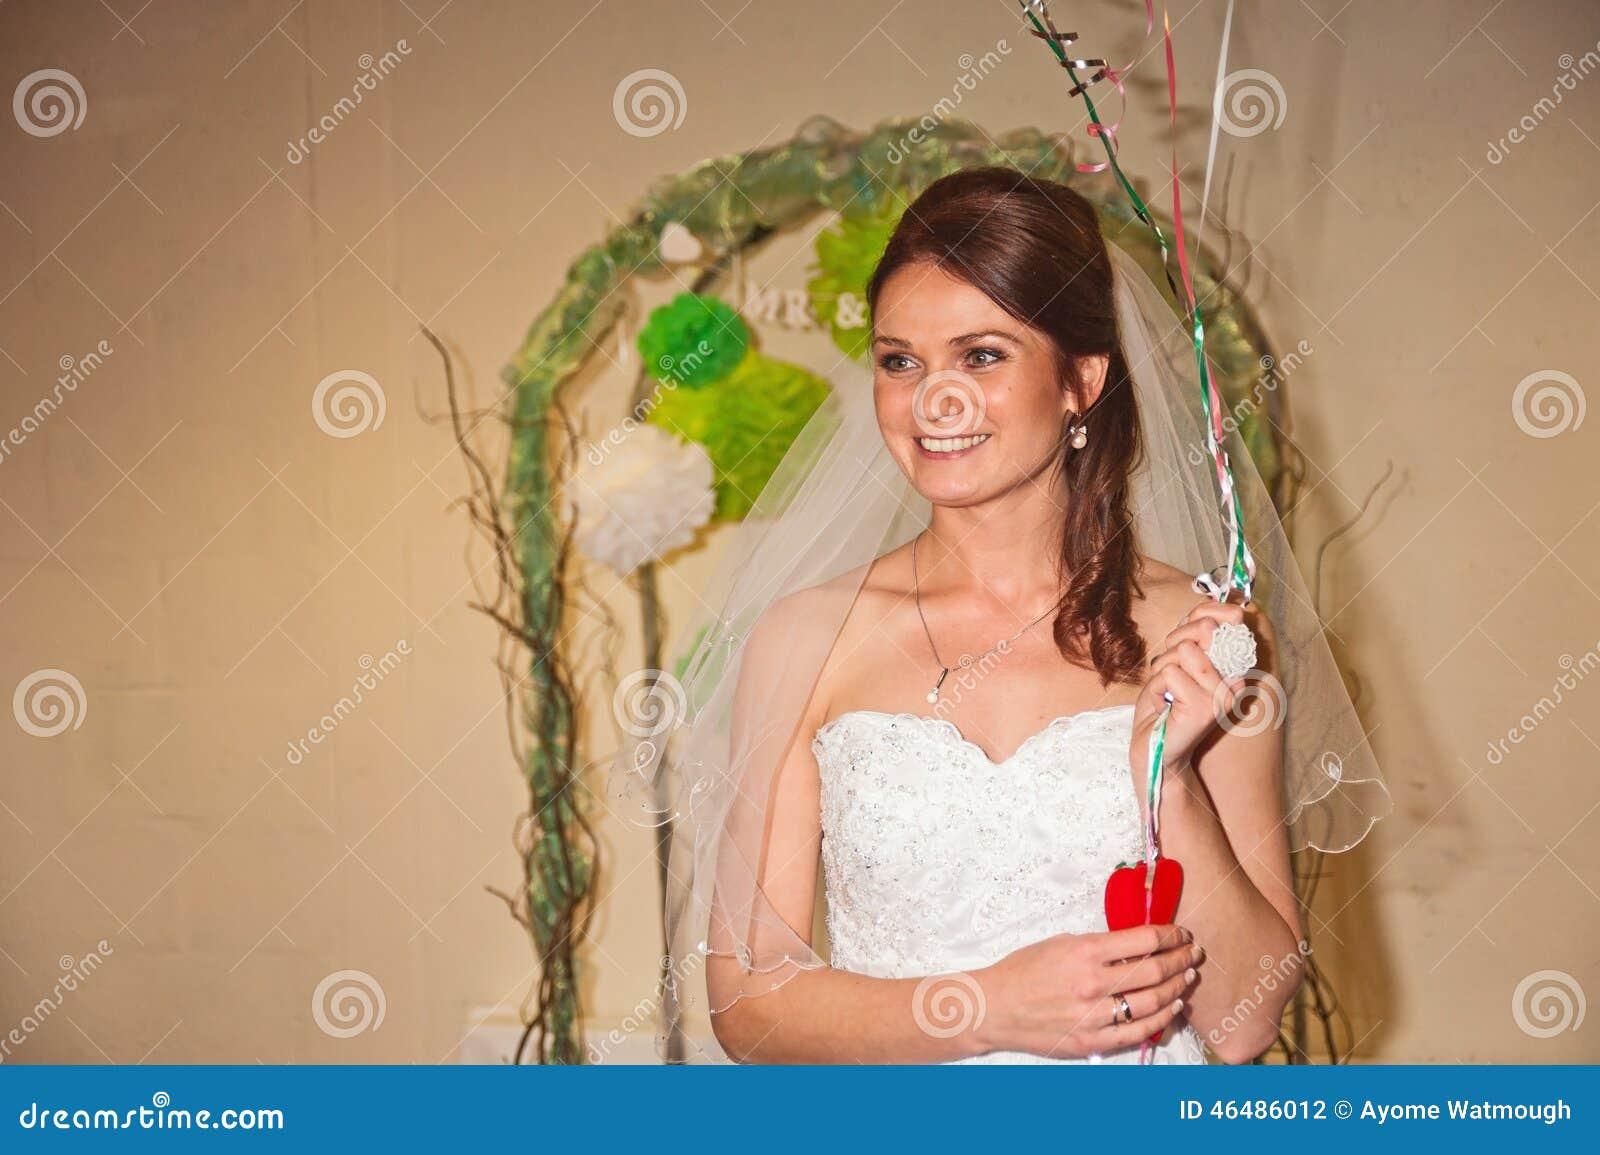 Bride welcomes guests